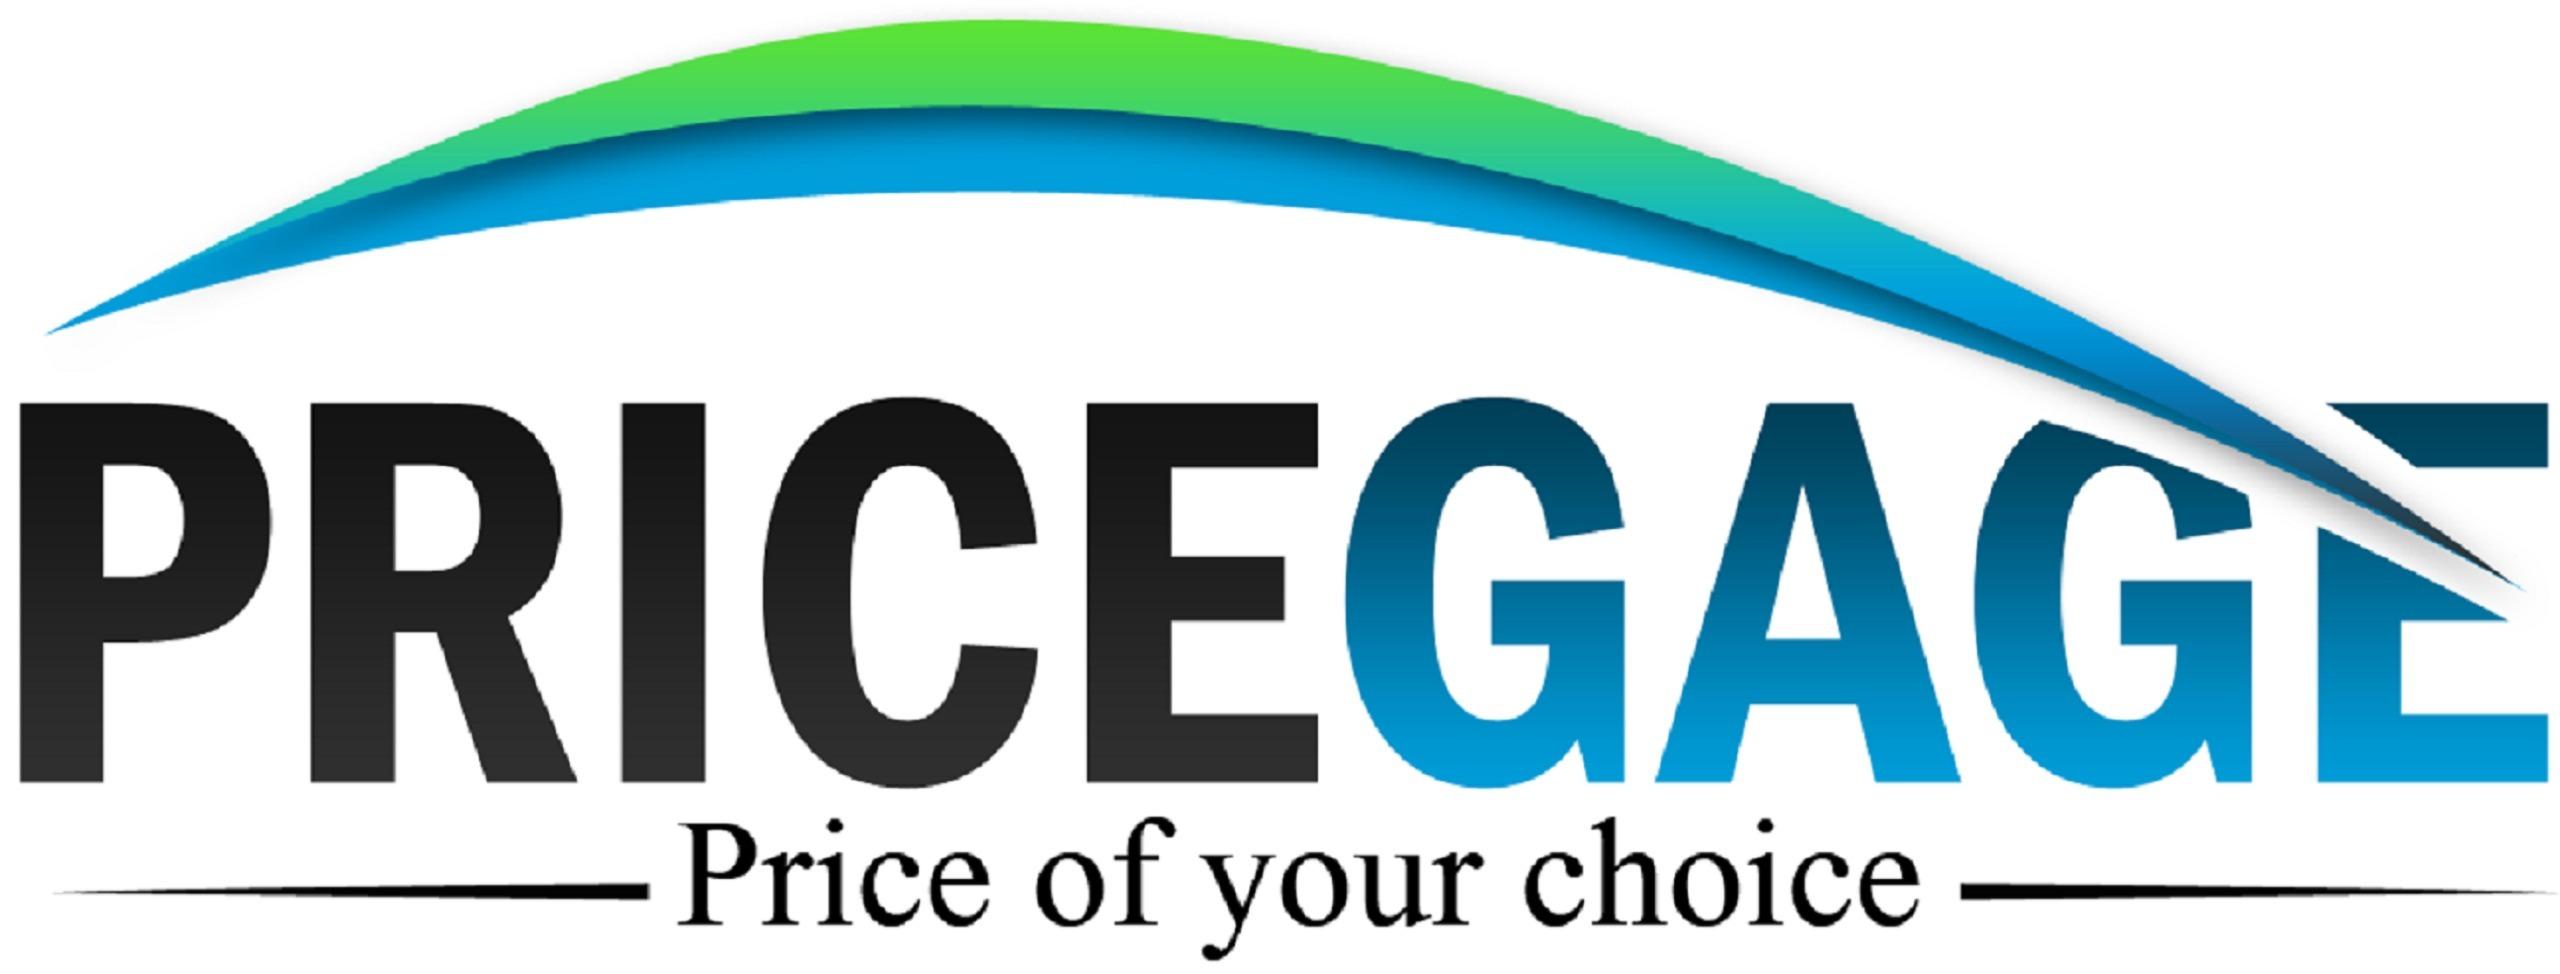 Pricegage (@pricegage) Cover Image